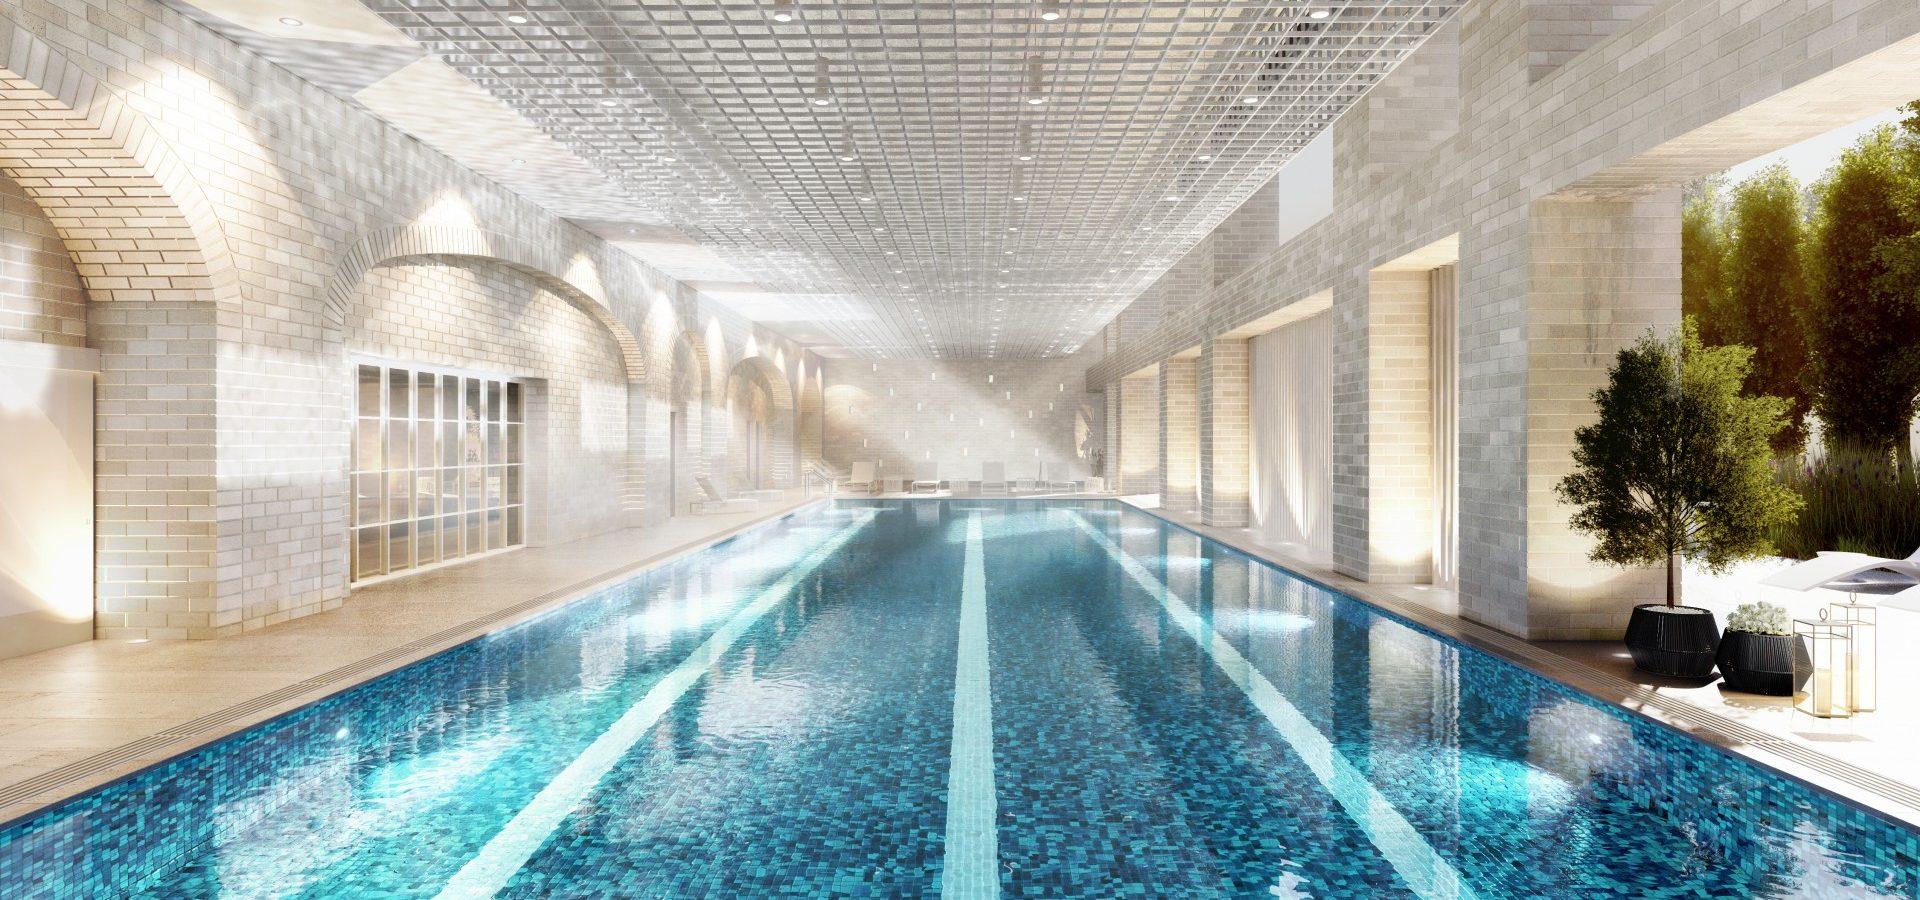 20190203_Swimming Pool_Final